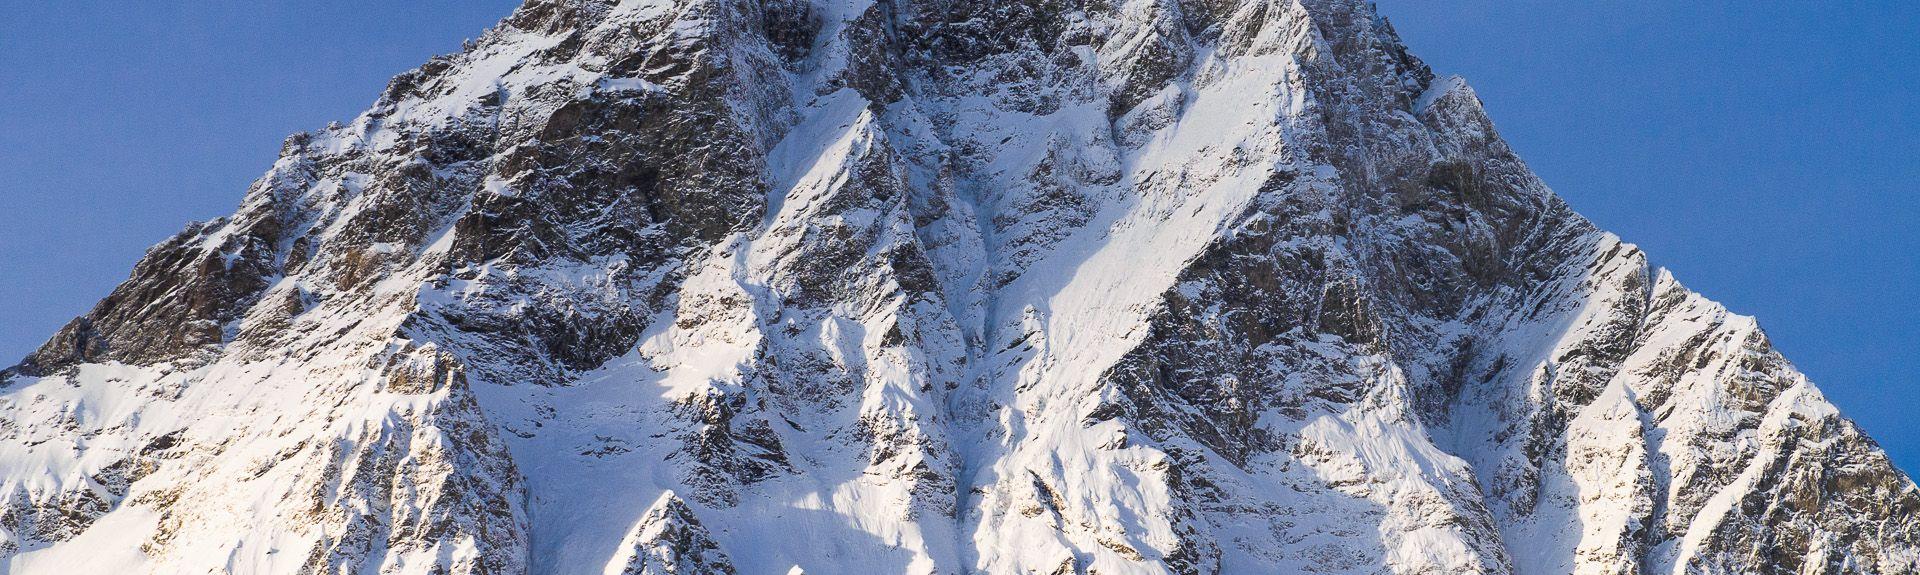 Mongnod, Torgnon, Val d'Aoste, Italie